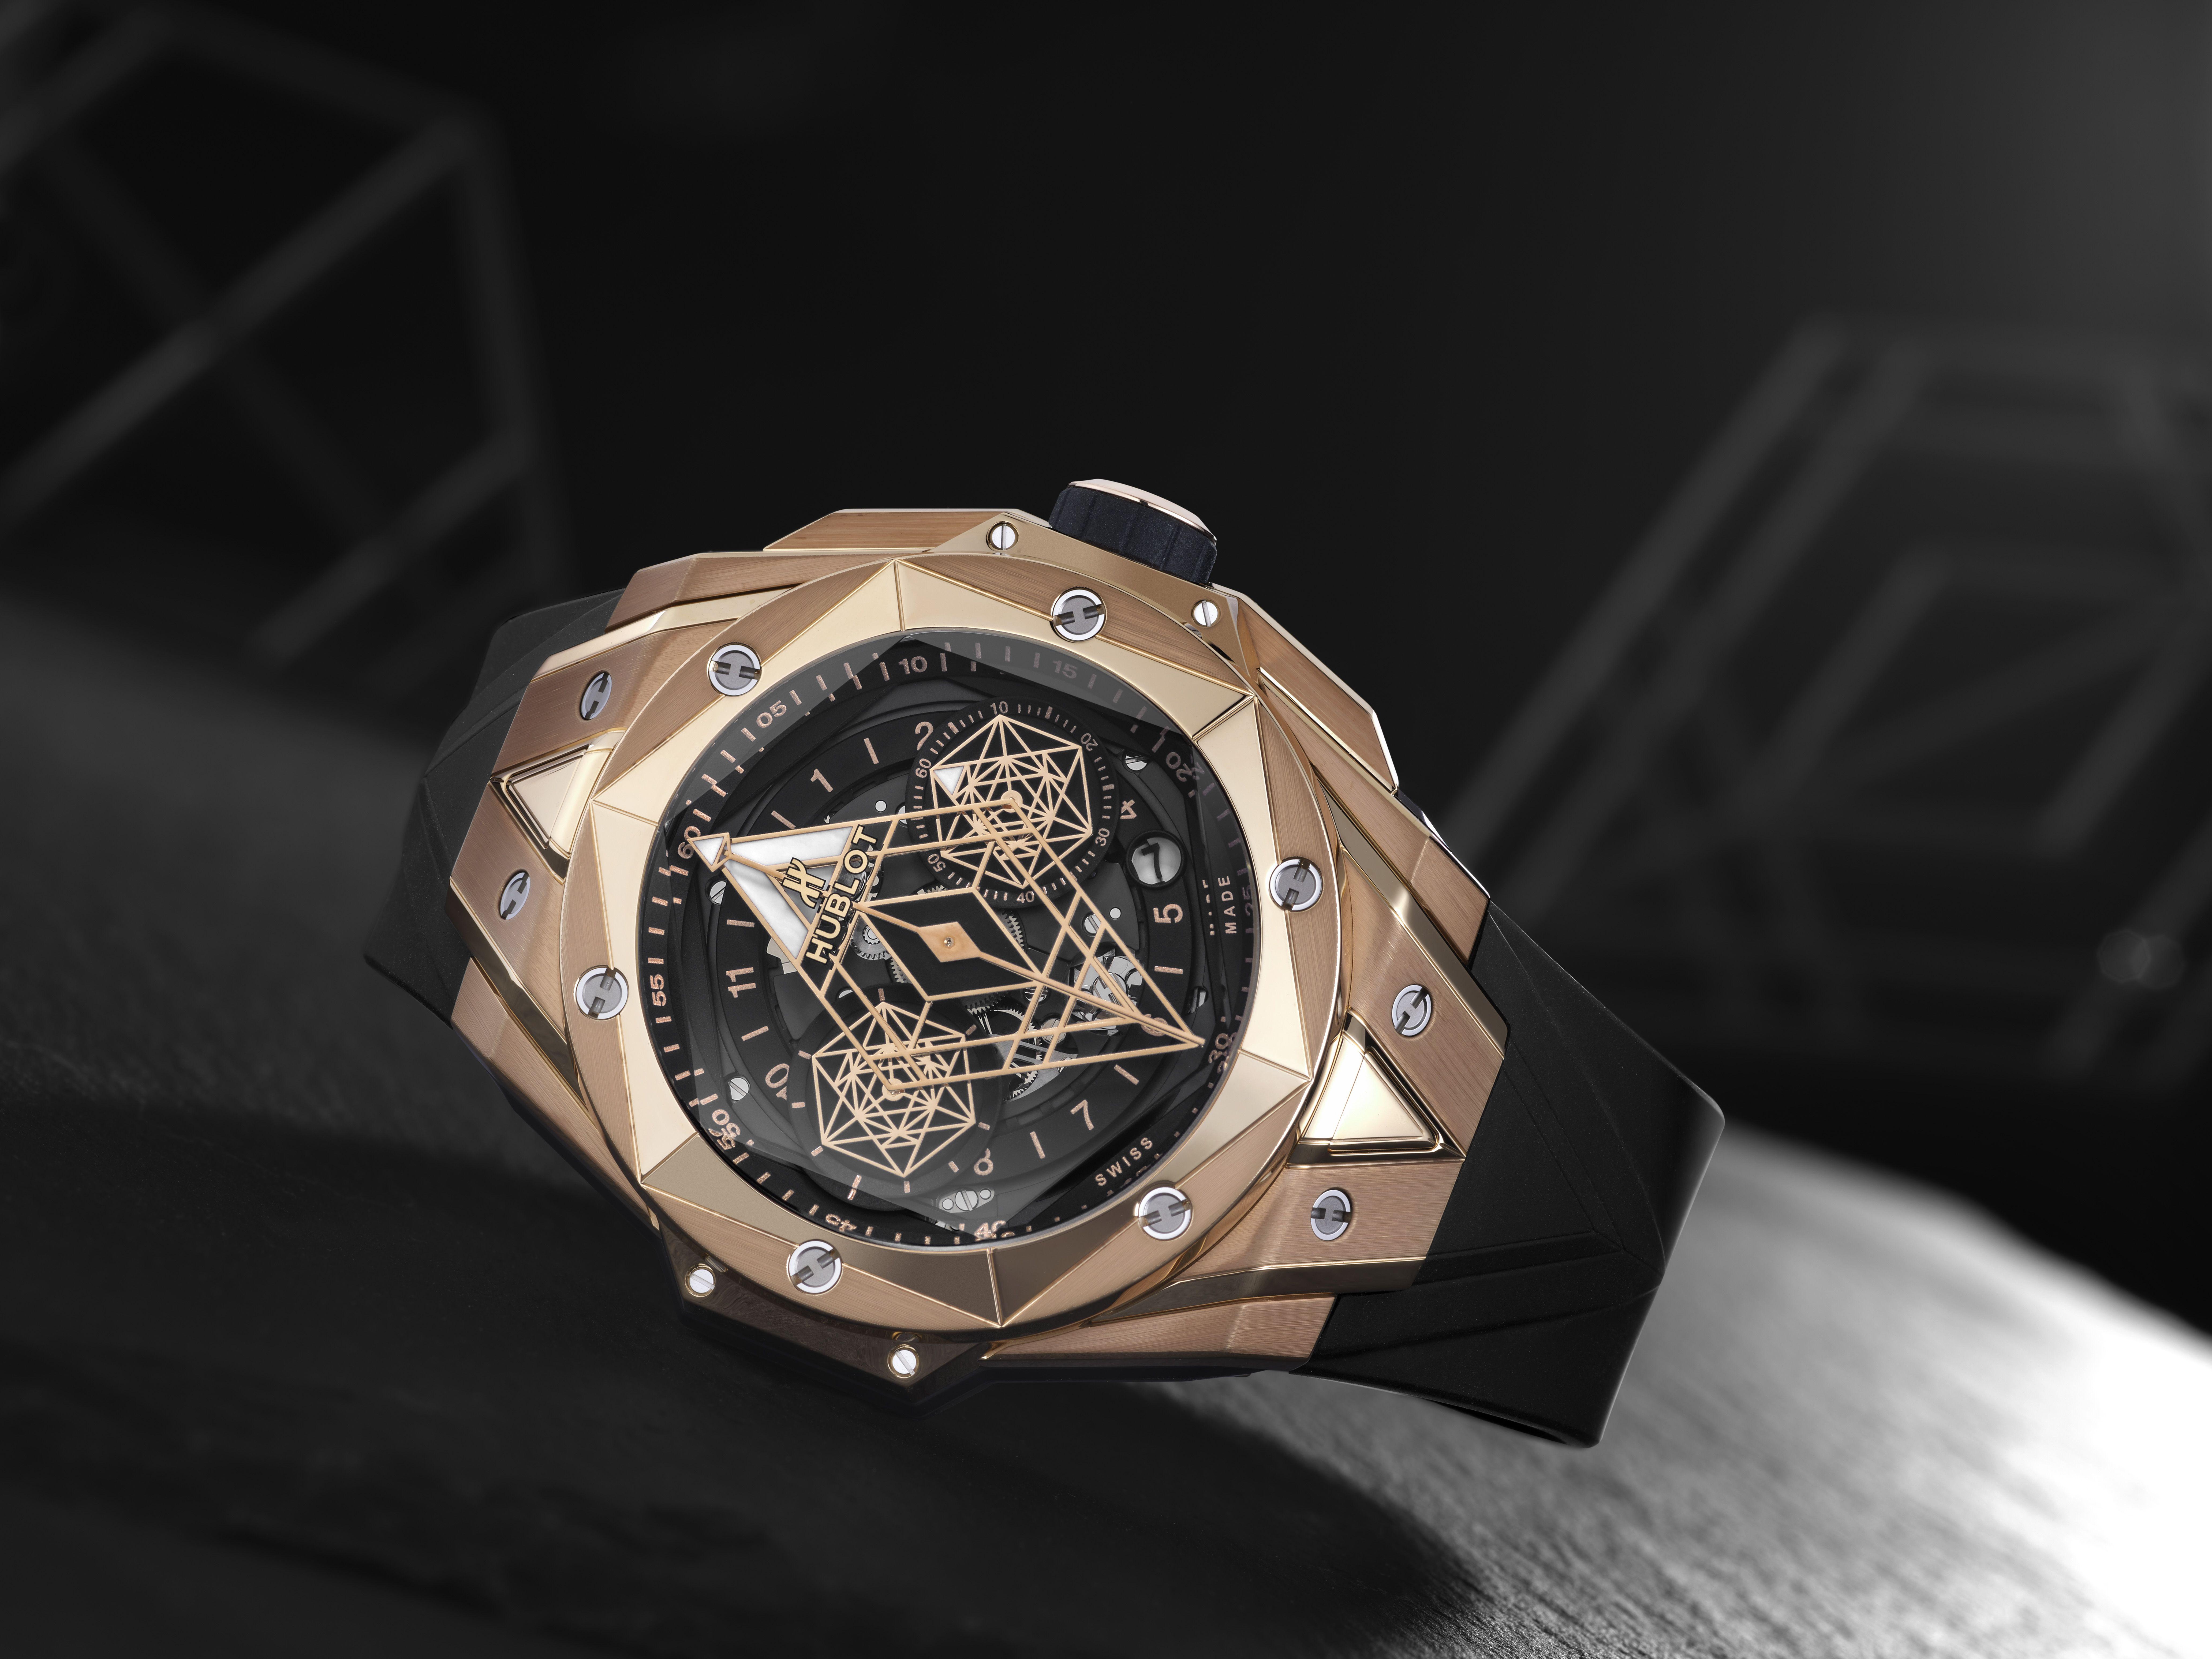 Hublot Ceo Ricardo Guadalupe Gives The Scoop On The Brand S New Ferrari Watches Ferrari Watch Hublot New Ferrari